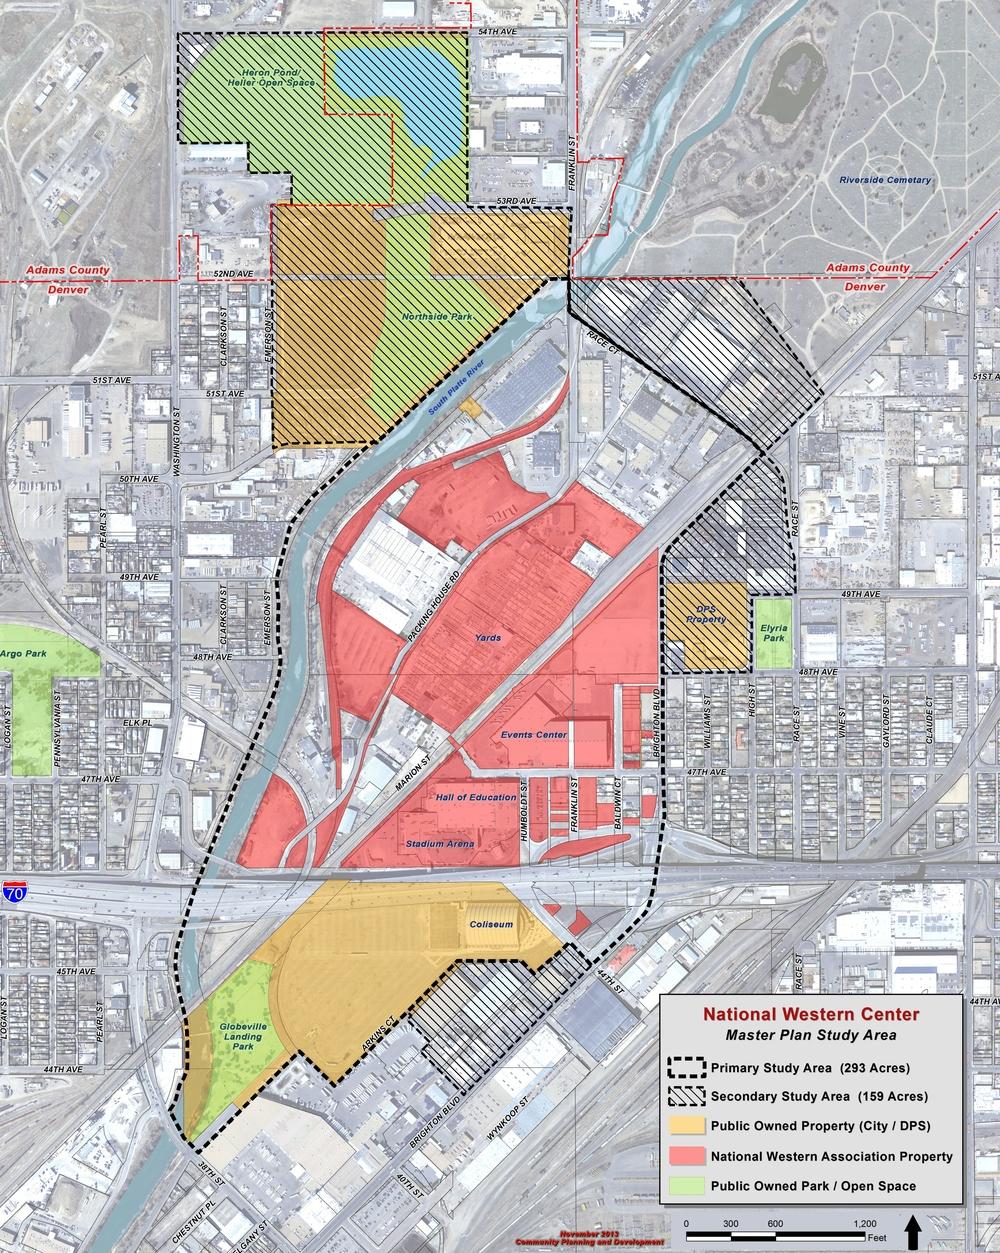 "North Denver Cornerstone Collaborative. ""National Western Center Fact Sheet."" 3. PDF. https://www.denvergov.org/content/dam/denvergov/Portals/728/documents/NDCC/NWC%20Fact%20Sheet%20Final.pdf. [Downloaded on 03 Apr 2016]"